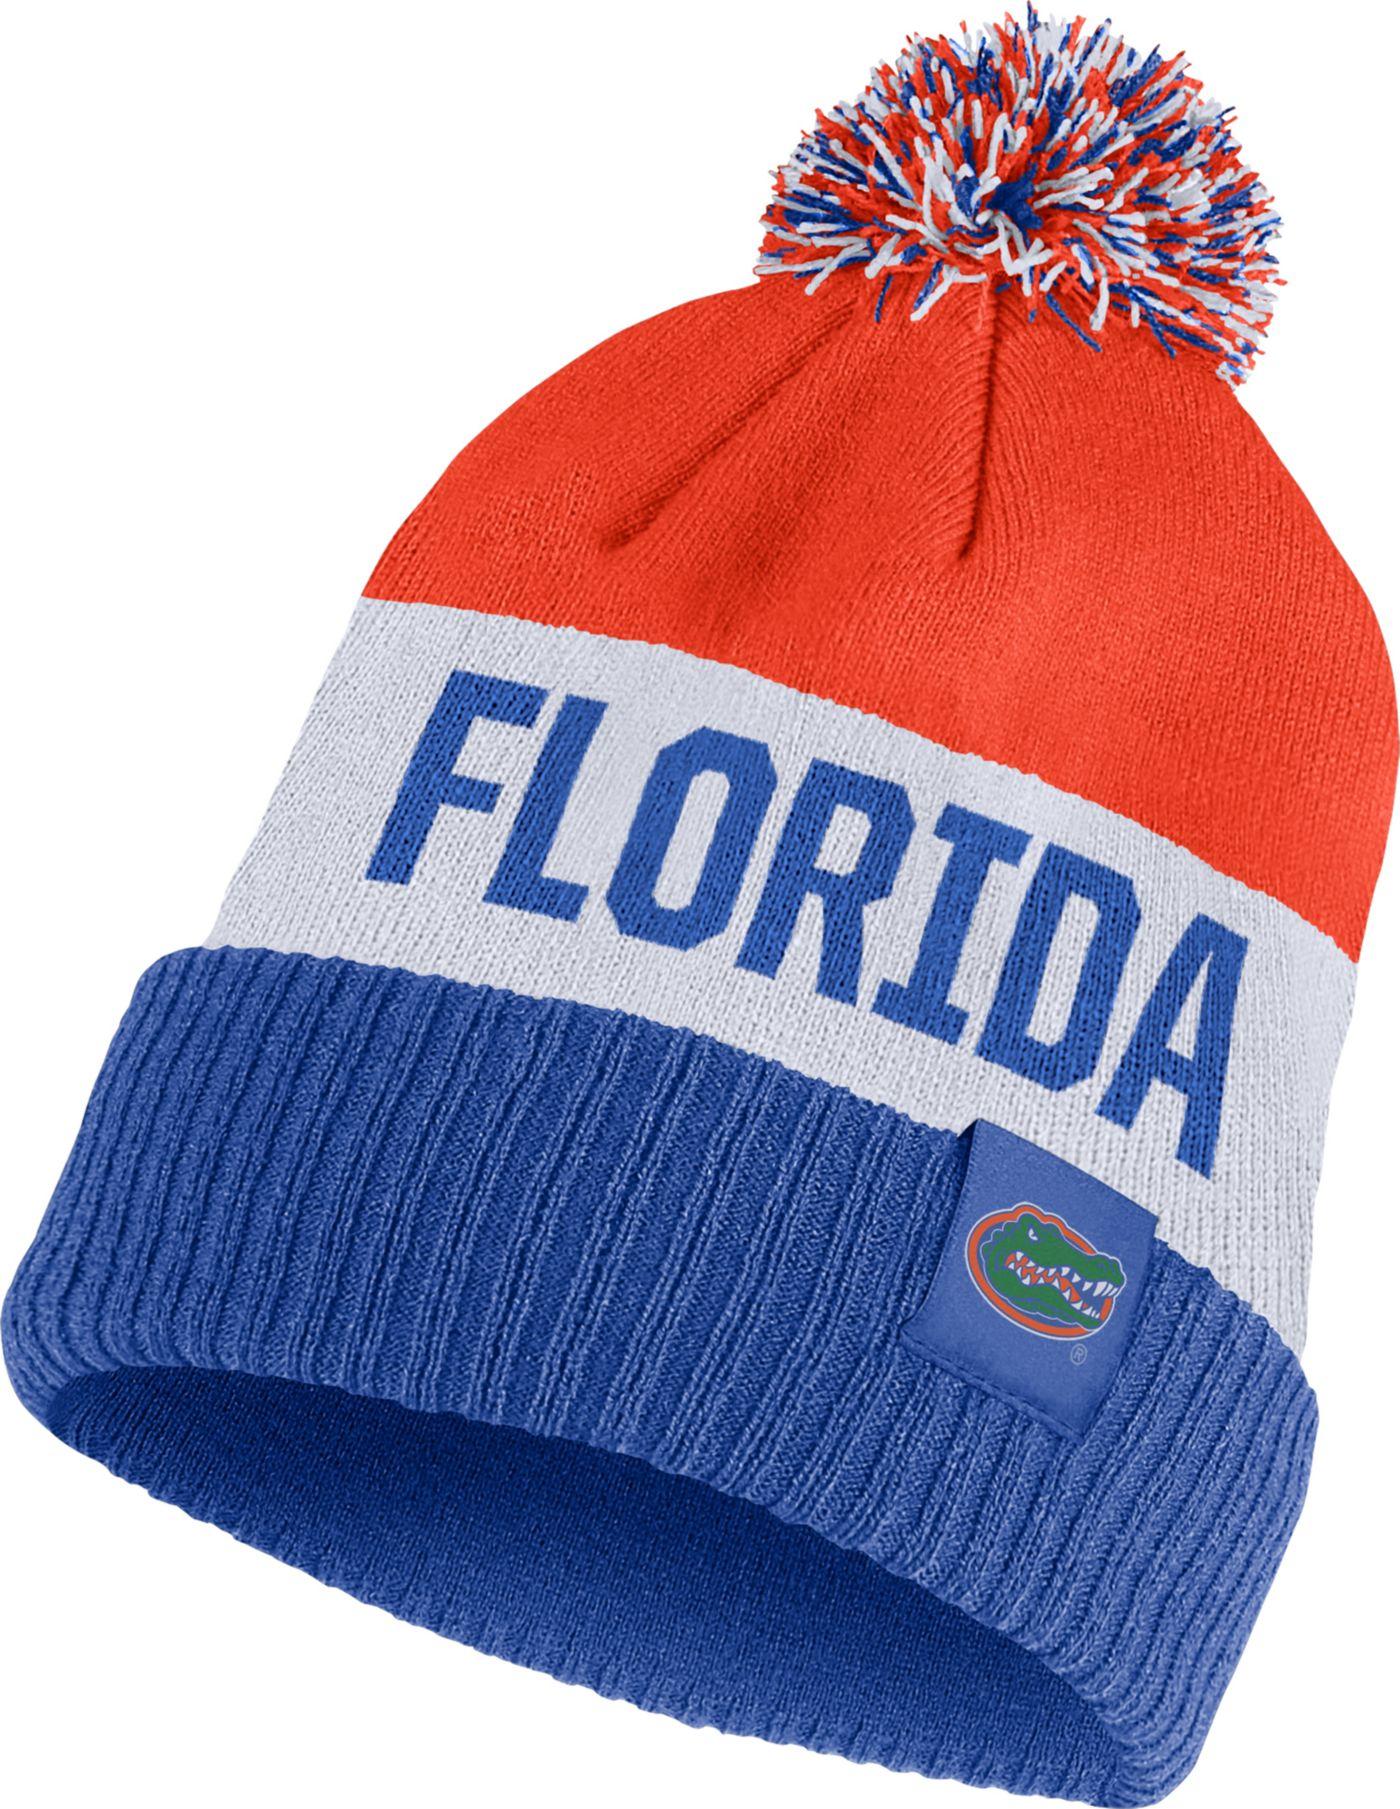 Nike Men's Florida Gators Orange/White/Blue Striped Cuffed Pom Beanie